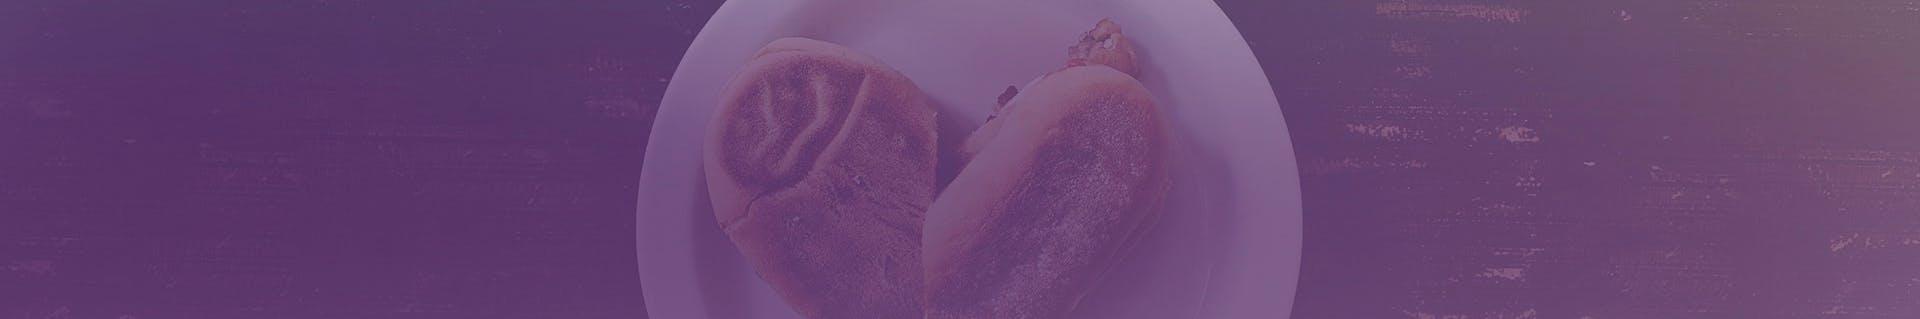 Sandwich shaped lke a heart on a plate.